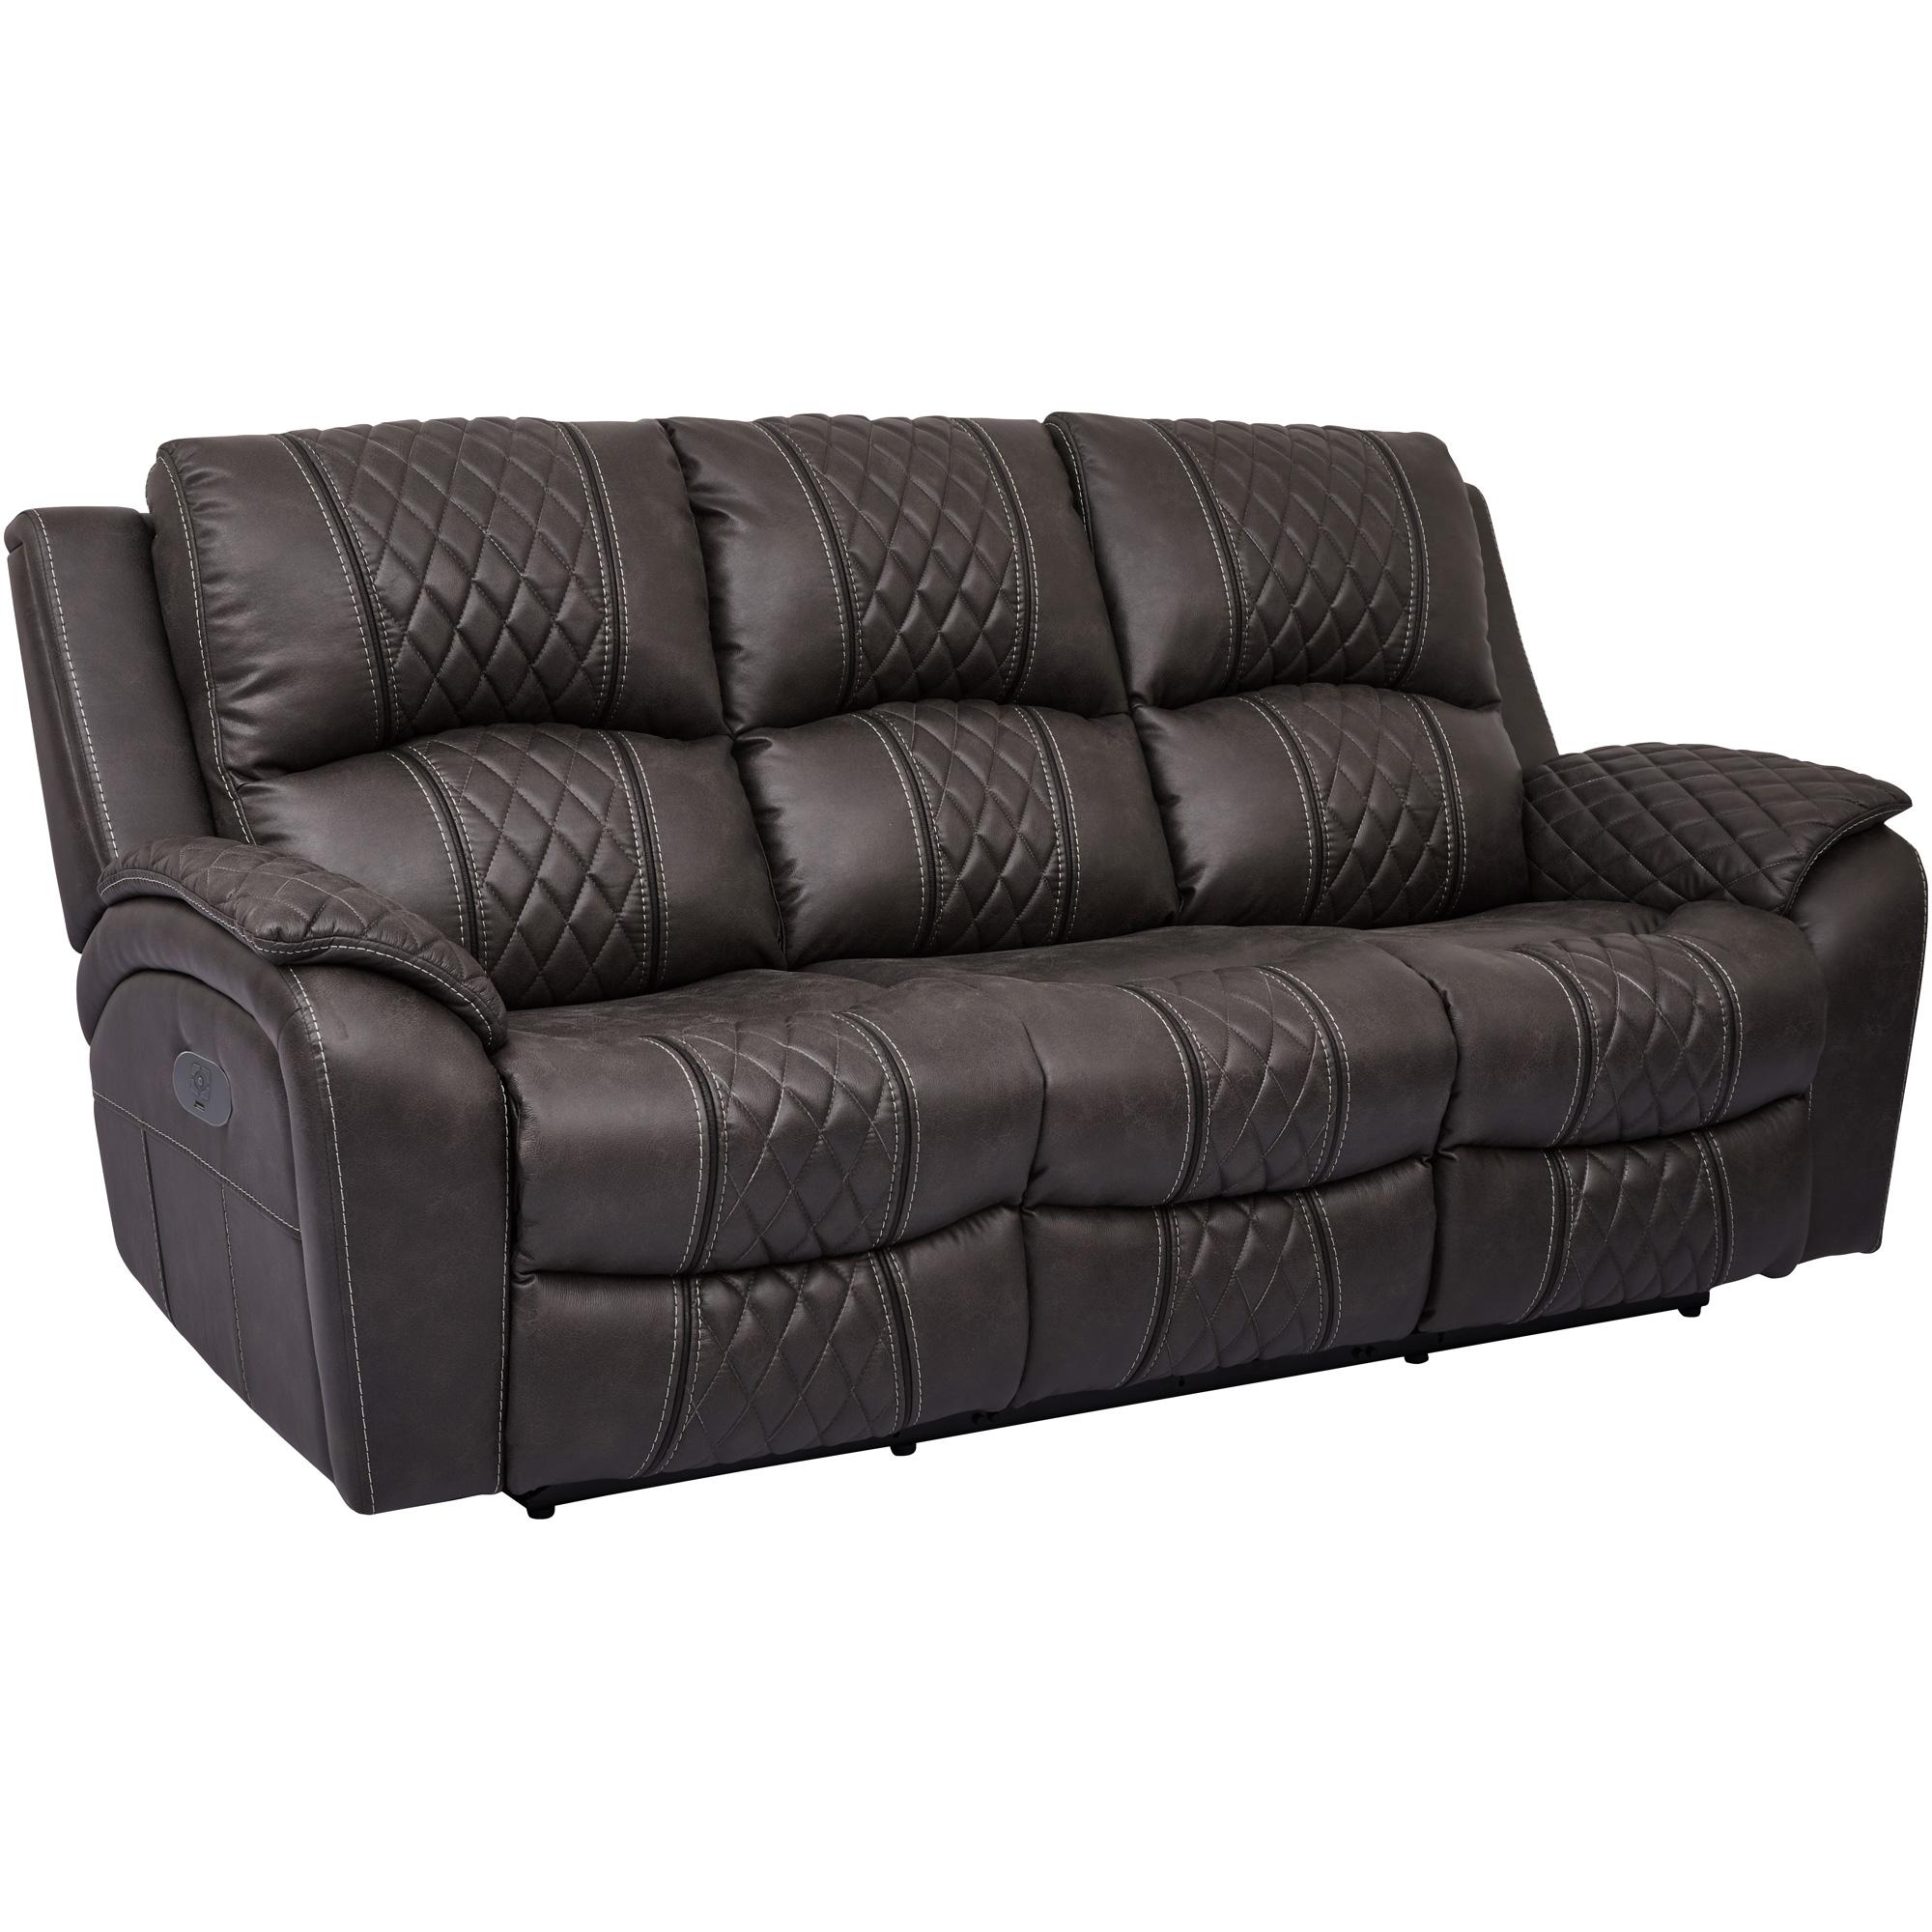 Wah Cheers | Starling Graphite Power Plus Reclining Sofa